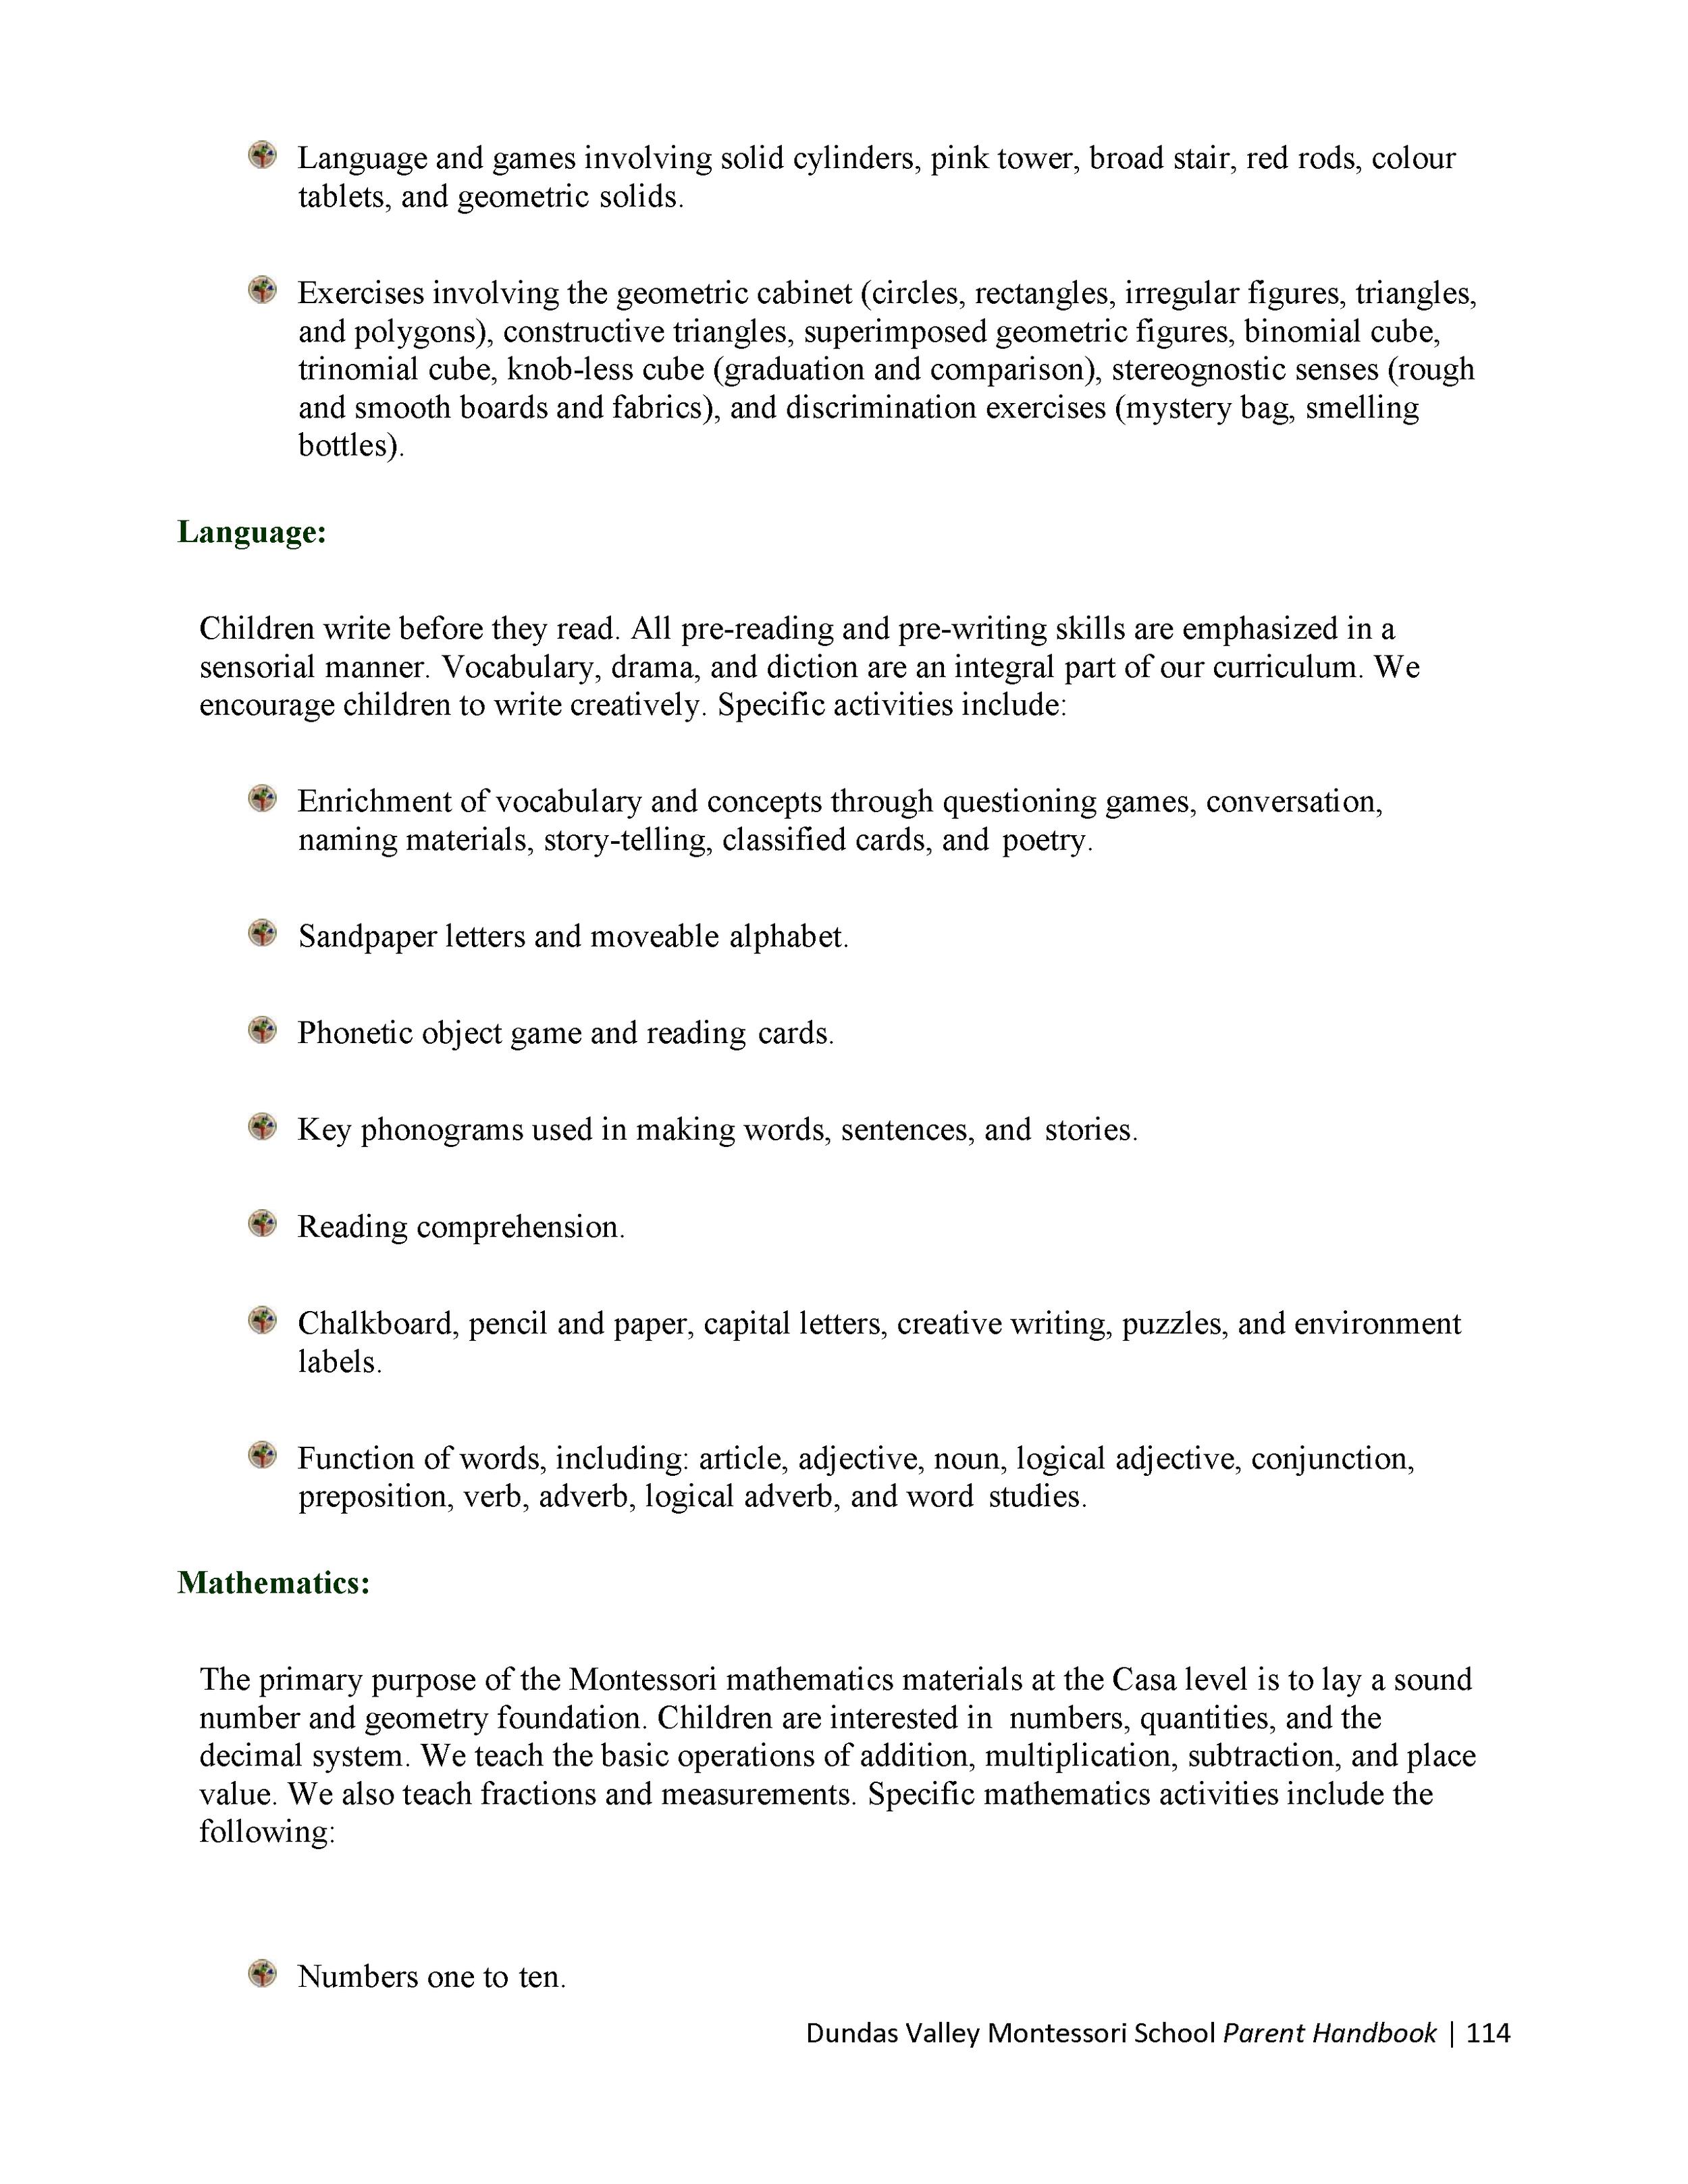 DVMS-Parent-Handbook-19-20_Page_116.png